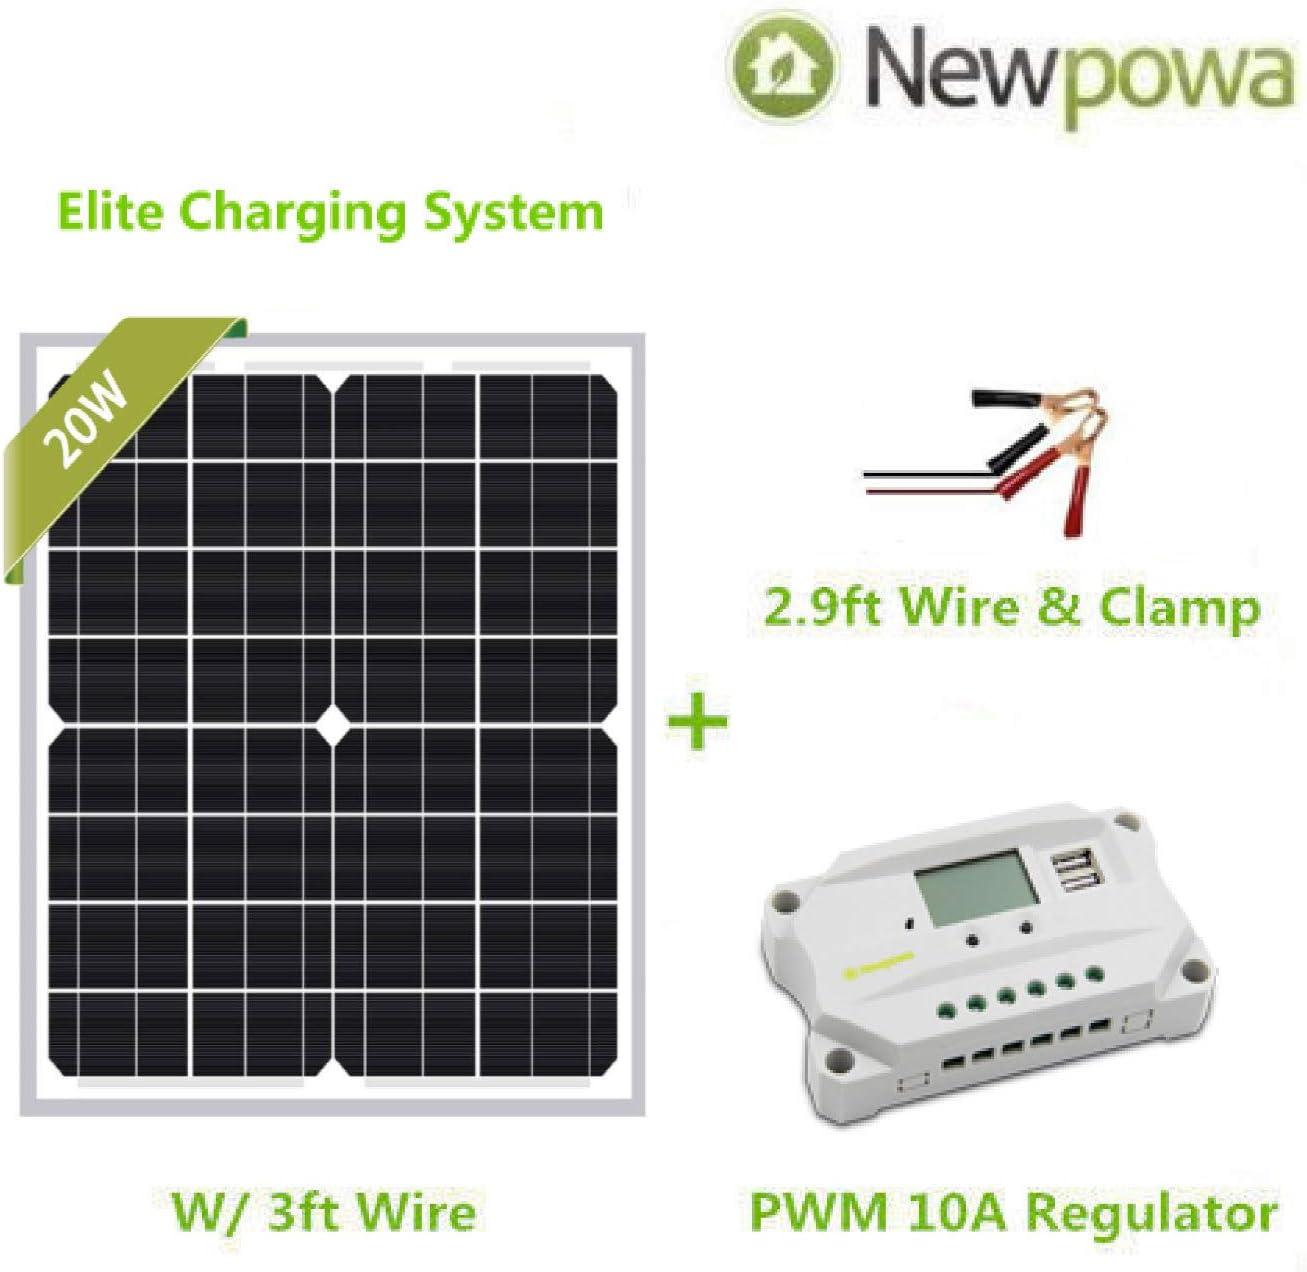 Newpowa 20w Watt 12v Solar Panel PWM 10a 12v Smart Charging Controller Regulator